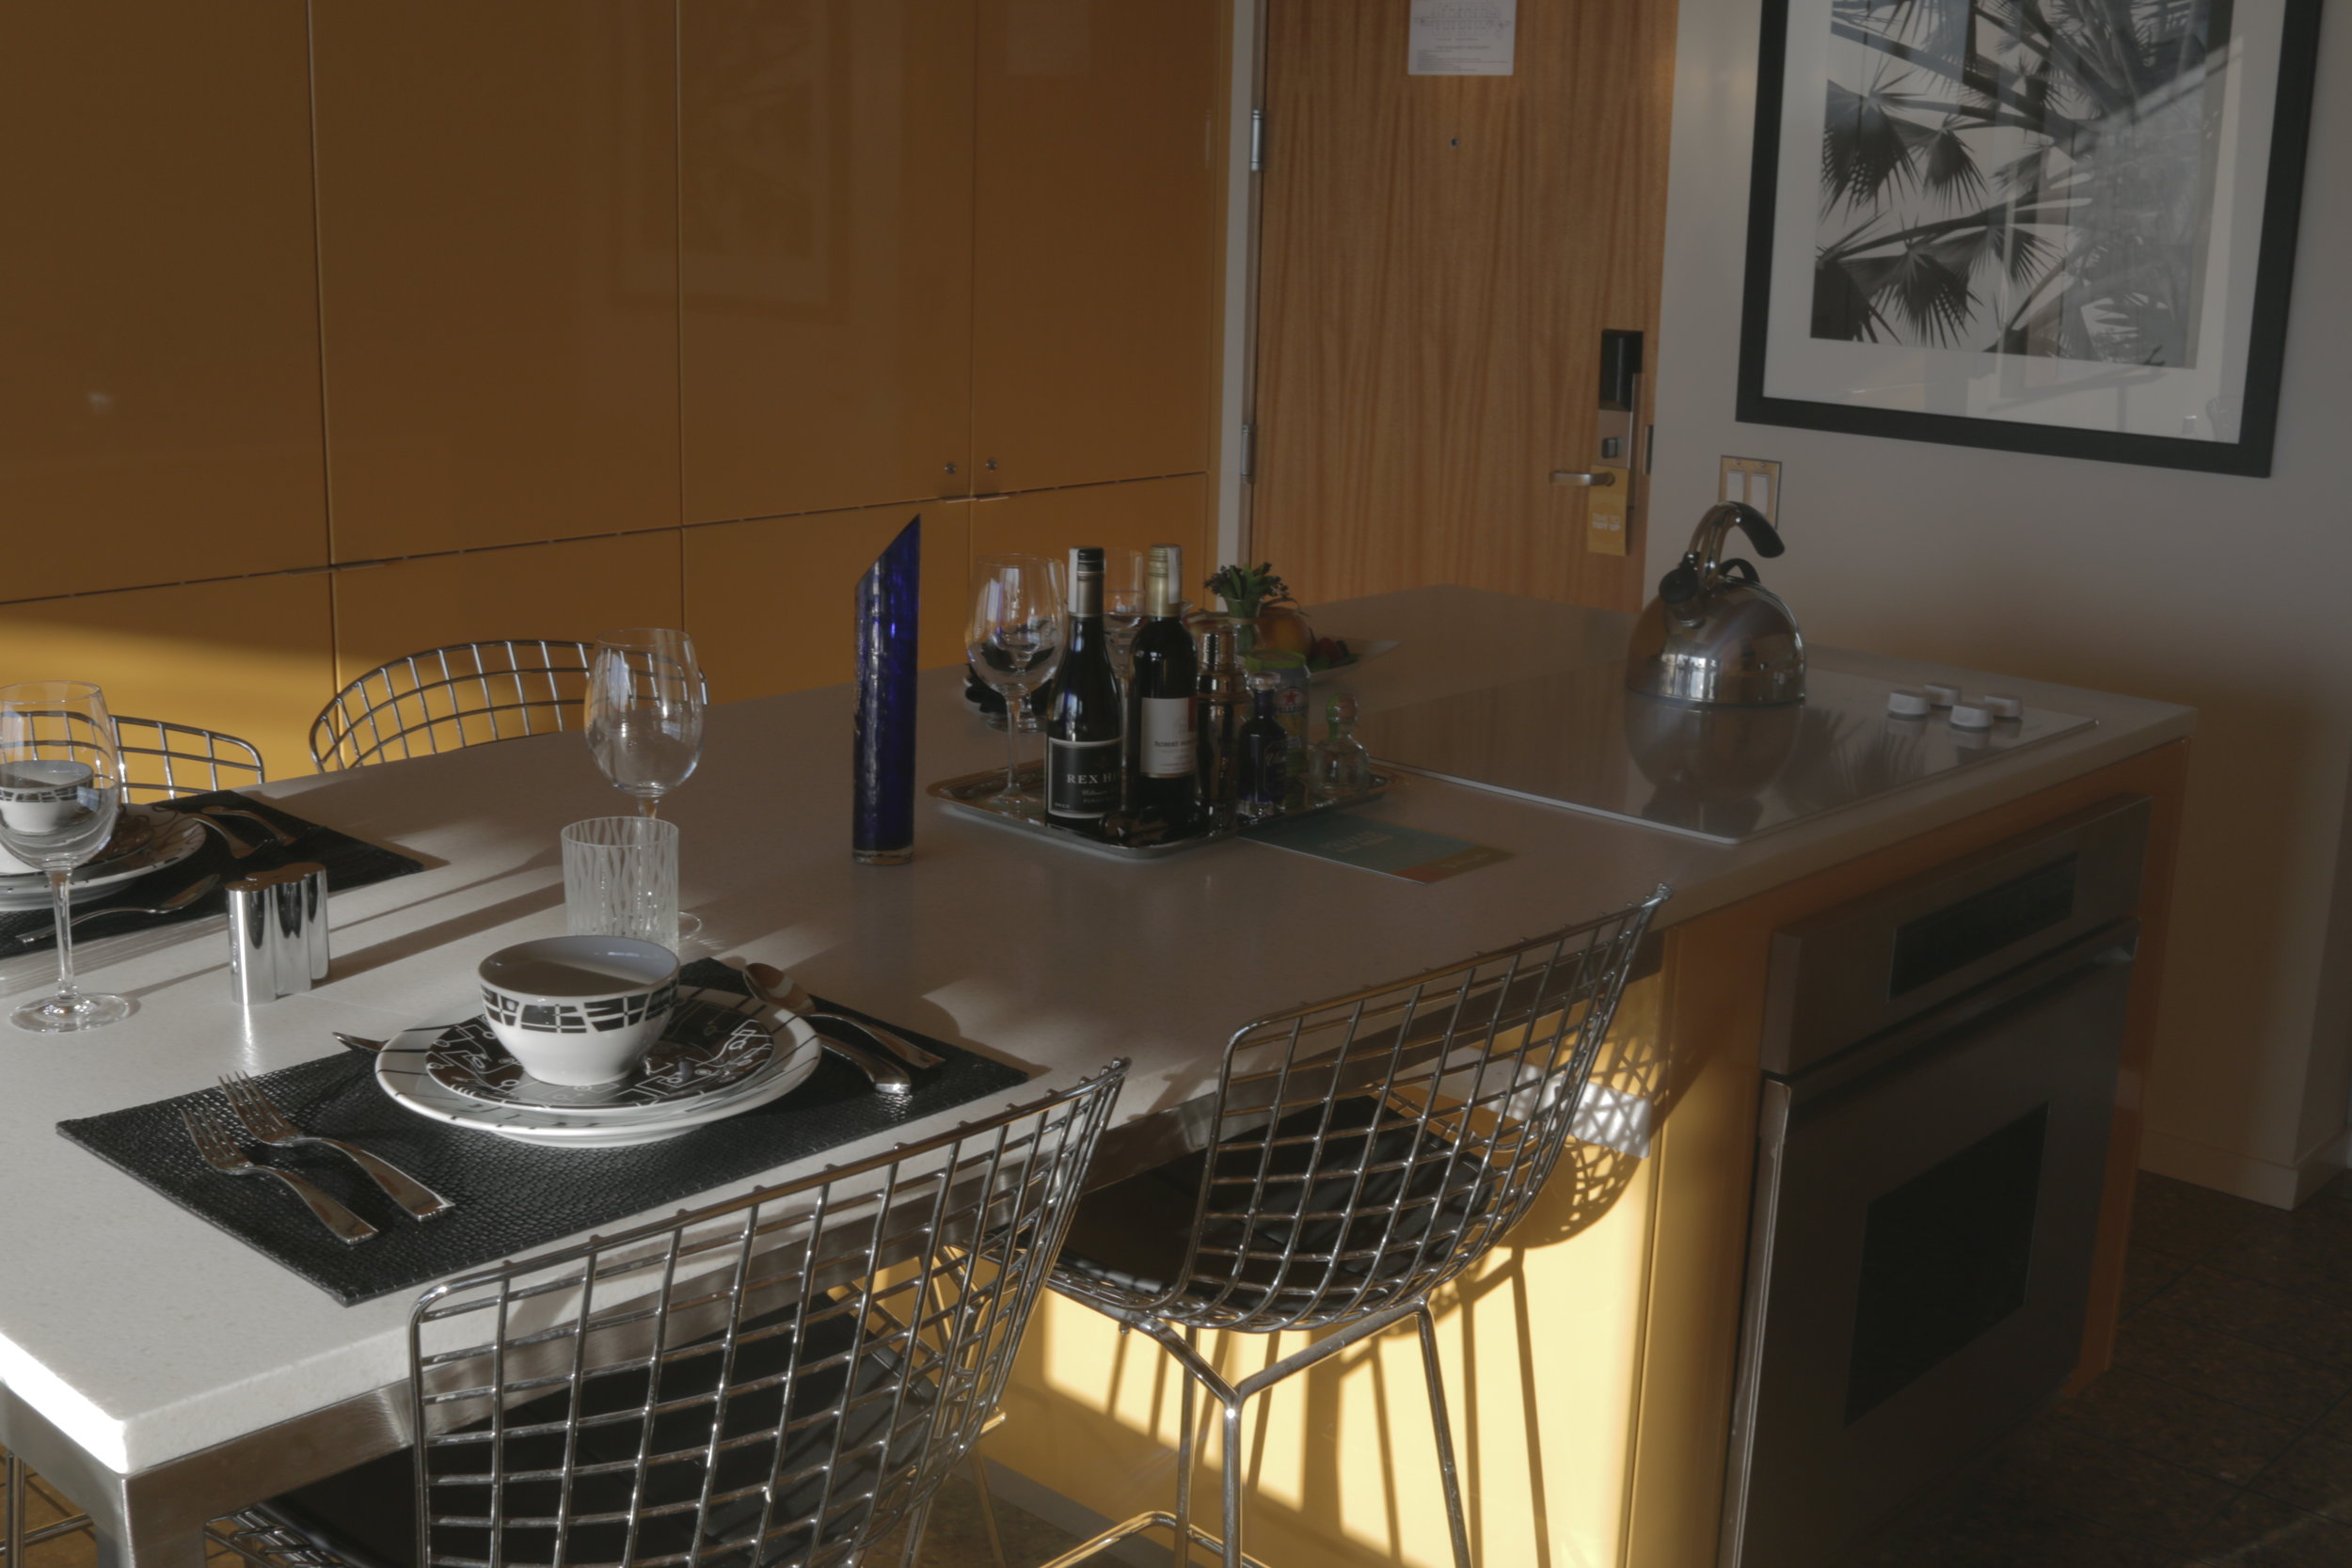 hotel-valley-ho-kitchen-tower-suite-scottsdale